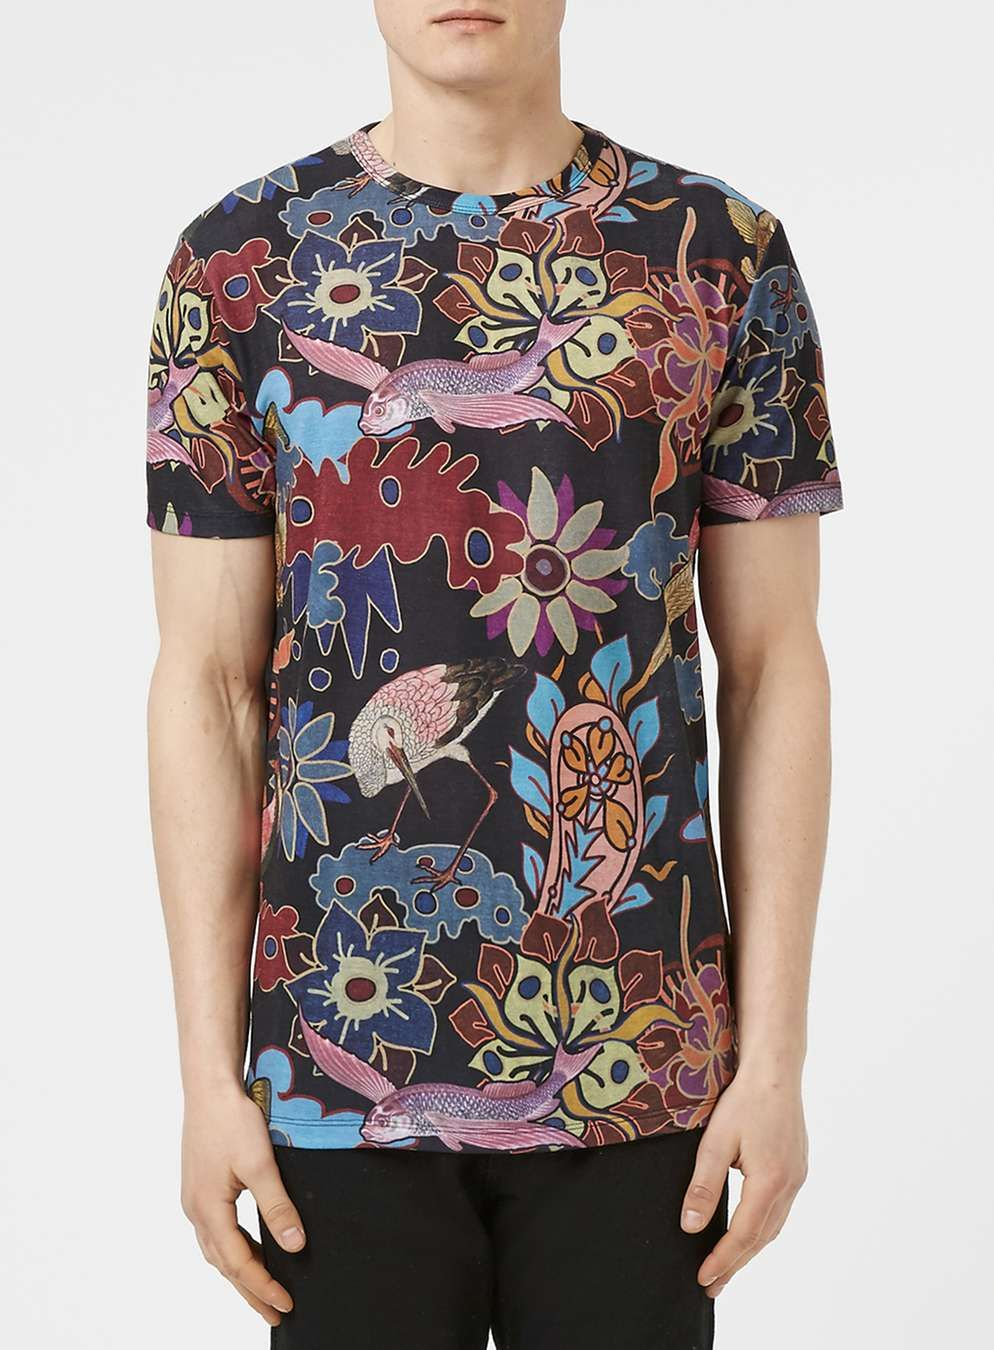 Jaded London Mens T-Shirt With Tapestry Print Khaki - Shirts & Tops